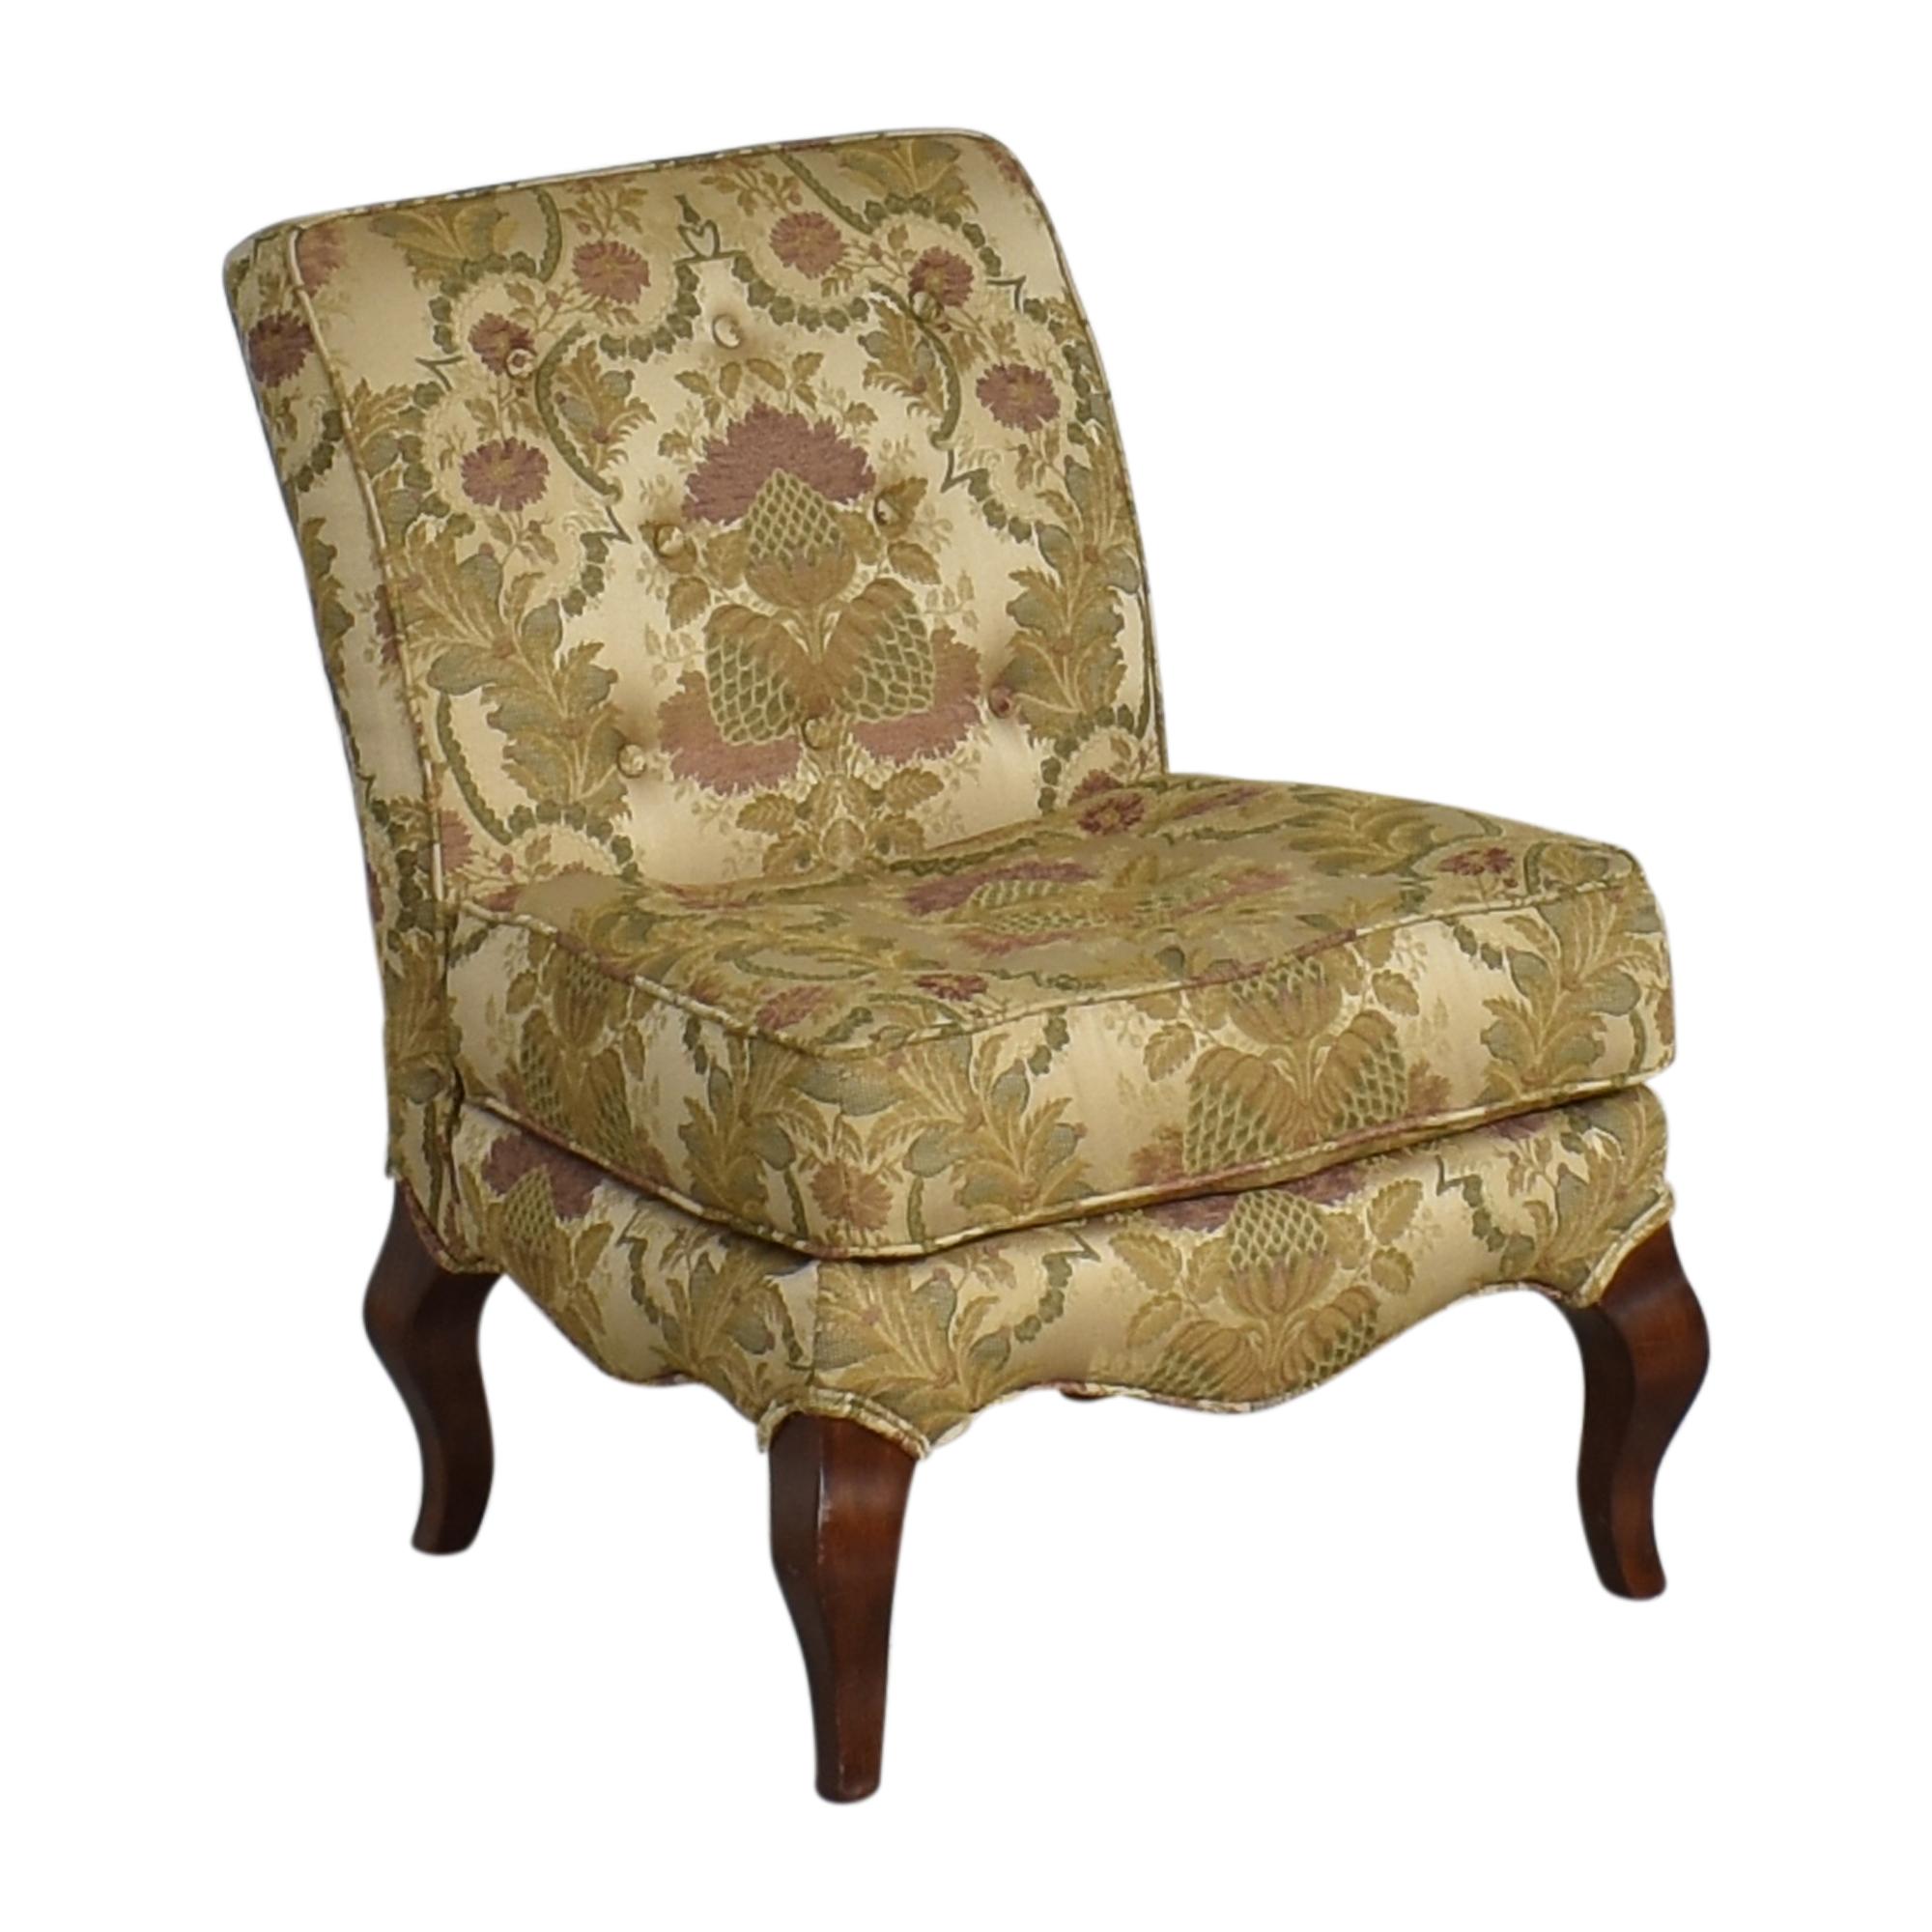 Domain Home Domain Home Slipper Chair price